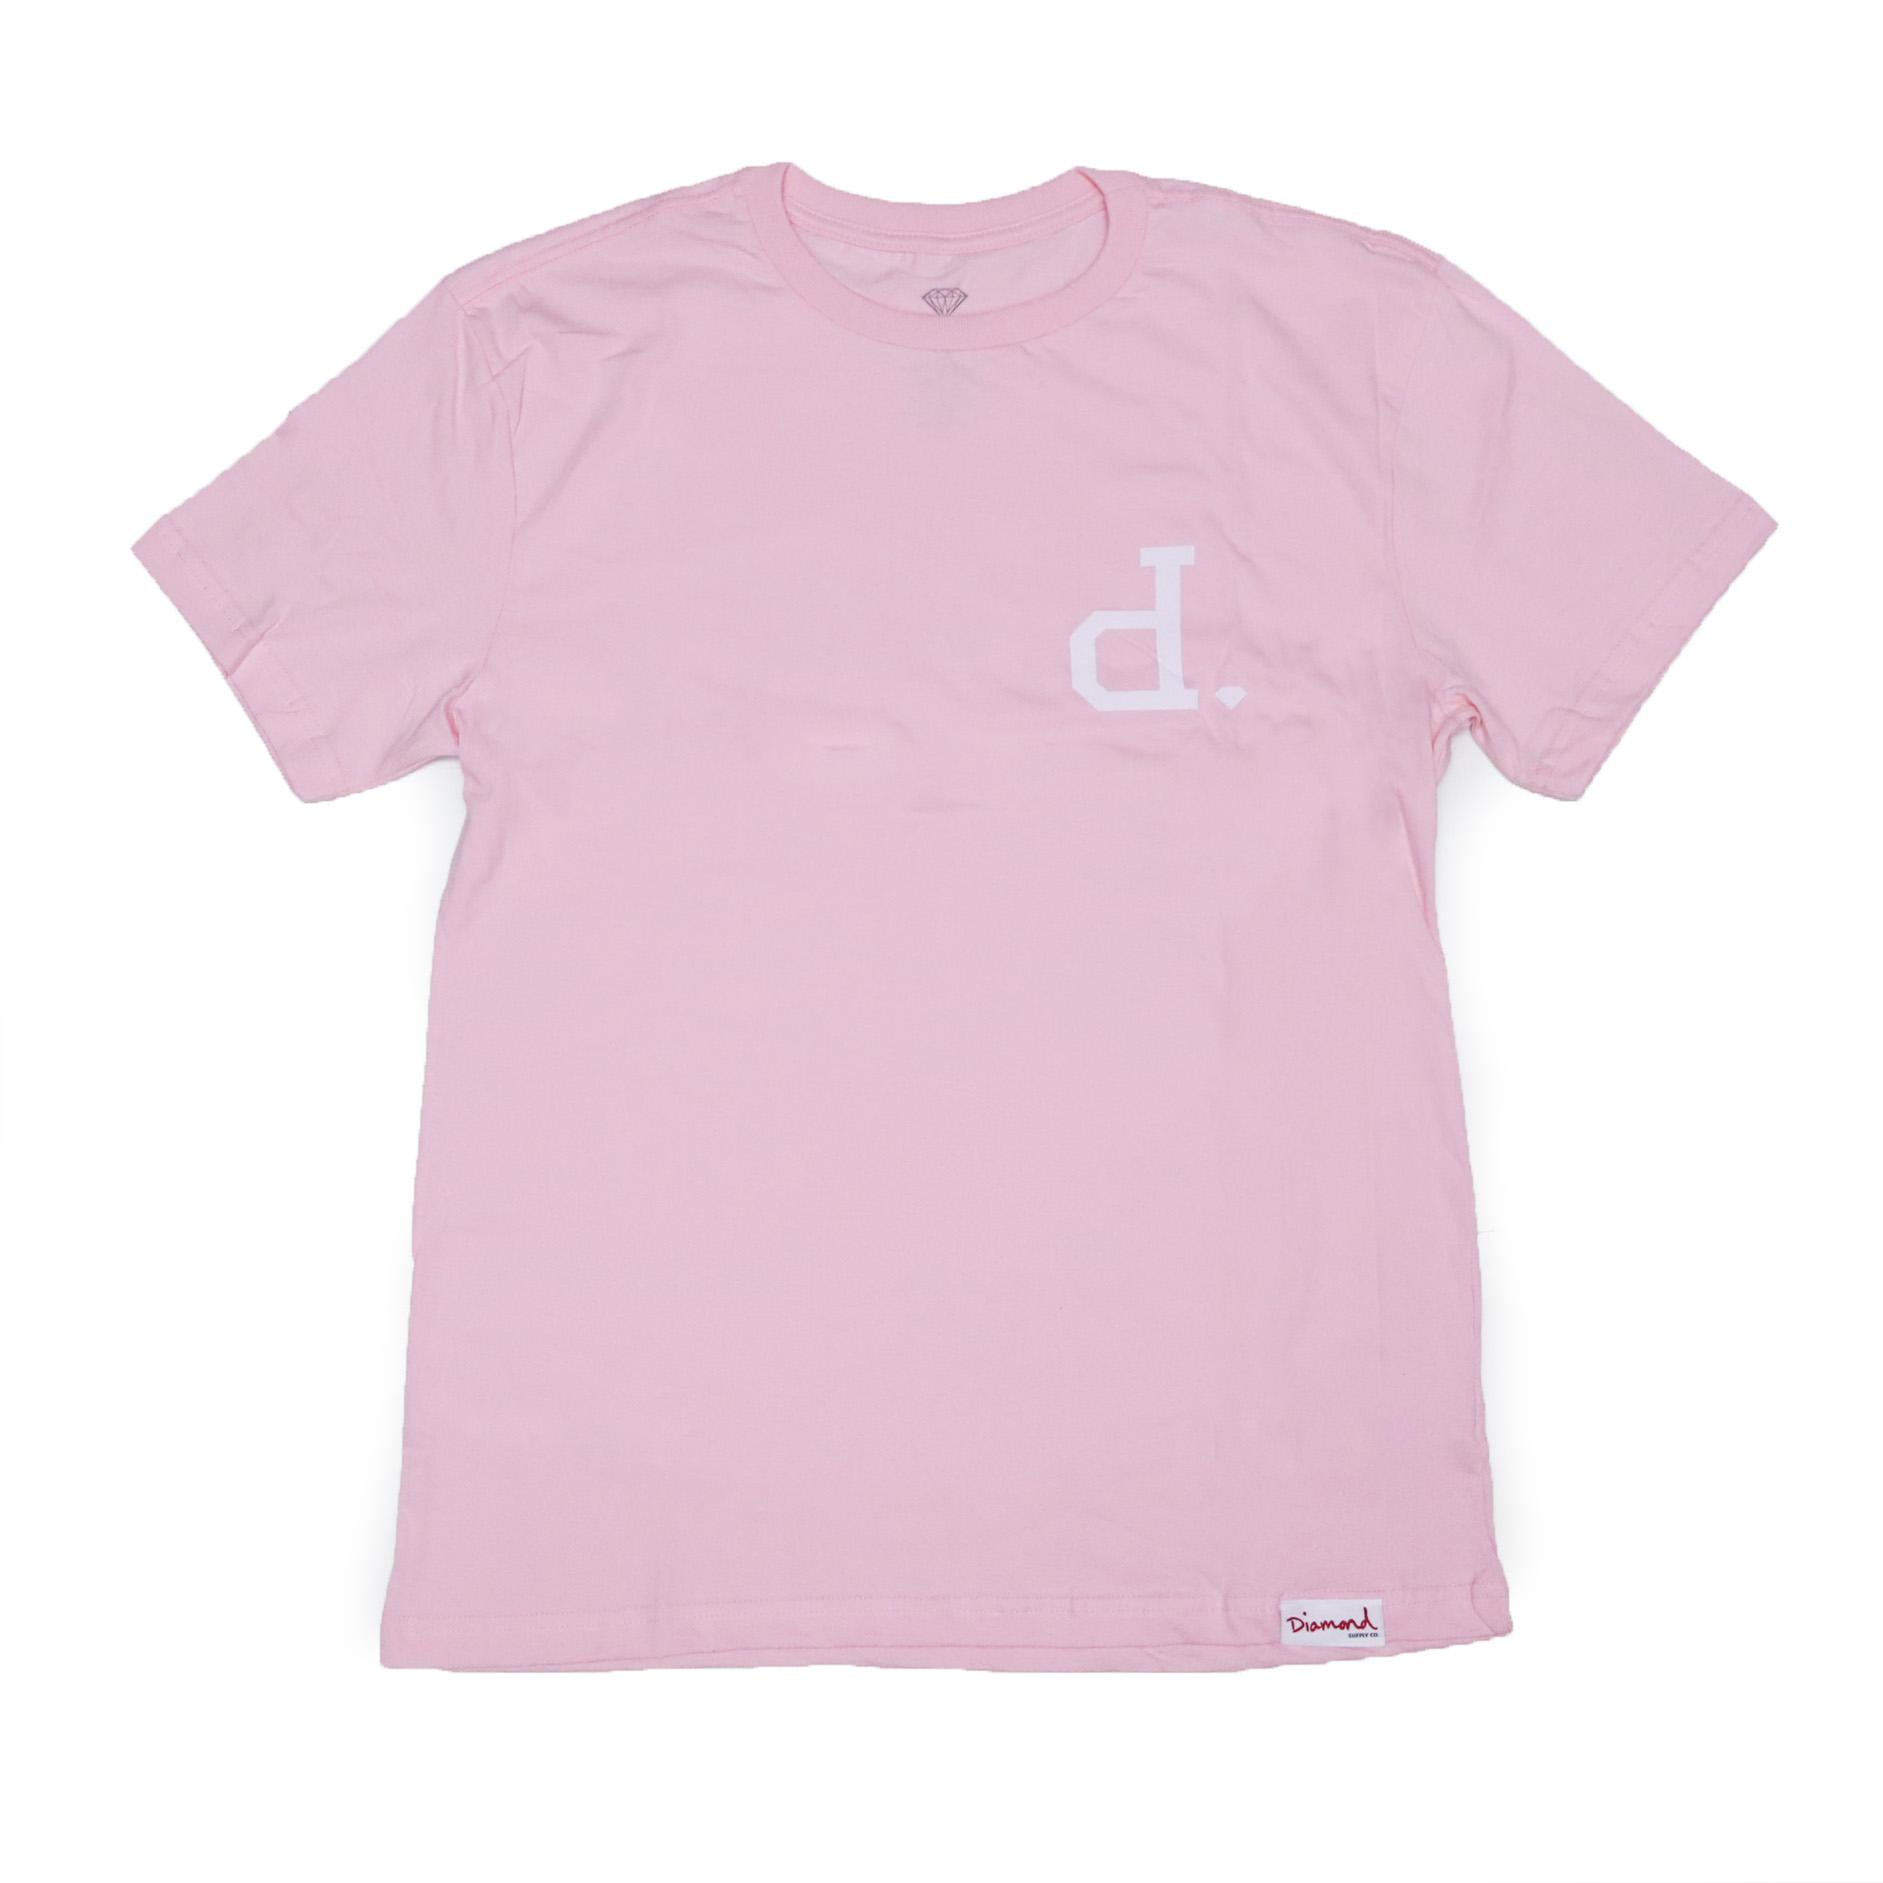 Camiseta Diamond Un Polo - Rosa/Branco